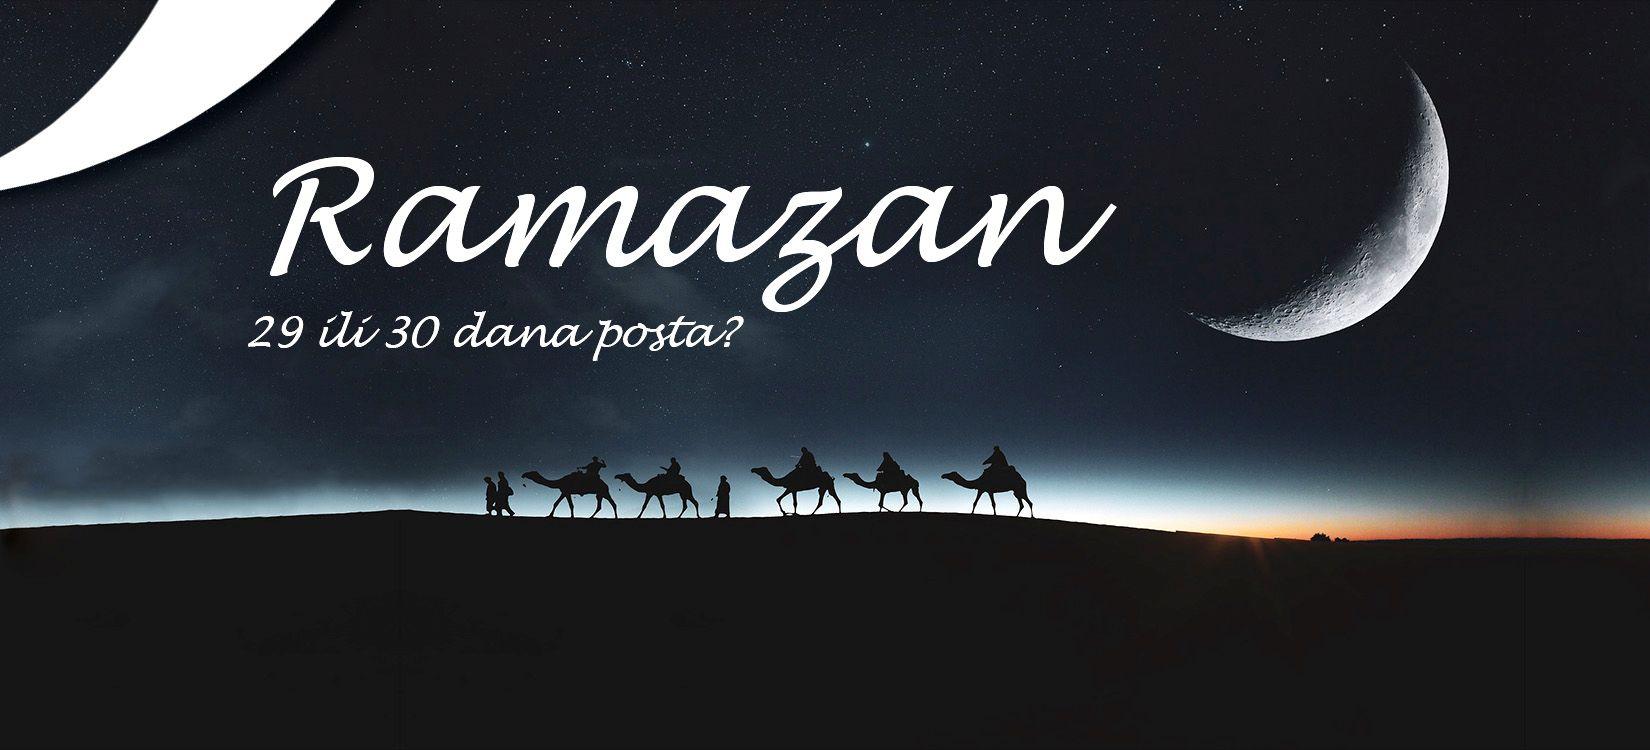 Ramazan i post